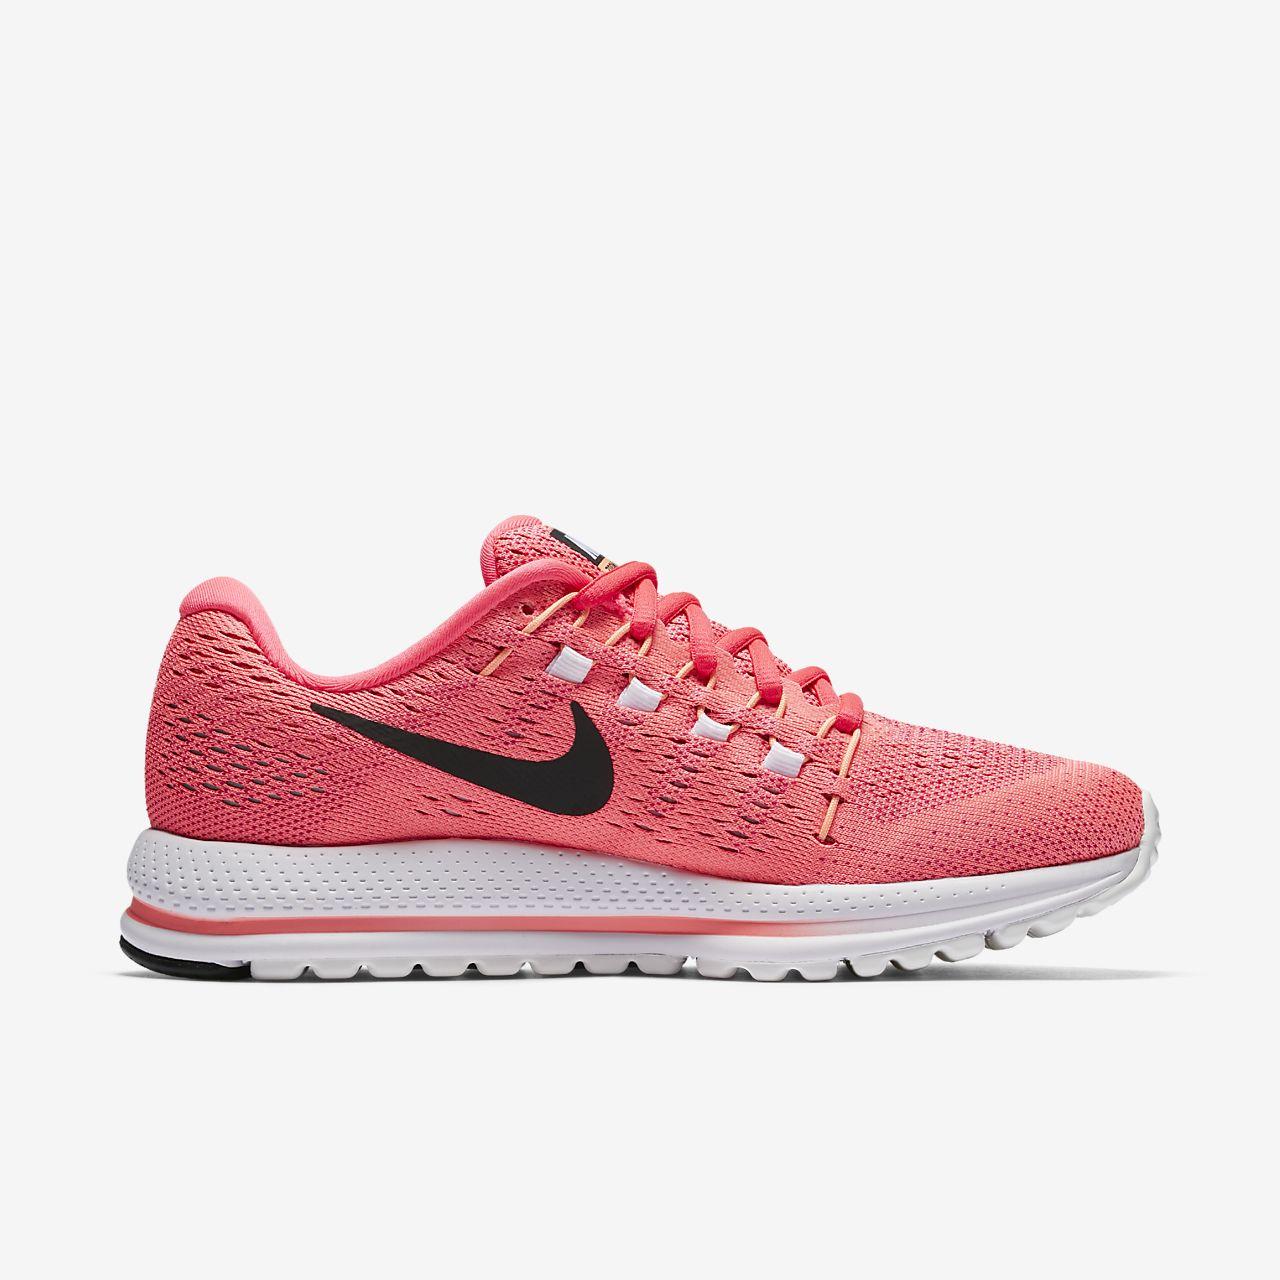 aa76577ab61 Home Women Zapatillas de running mujer. Nike Wmns Air Zoom Vomero 12